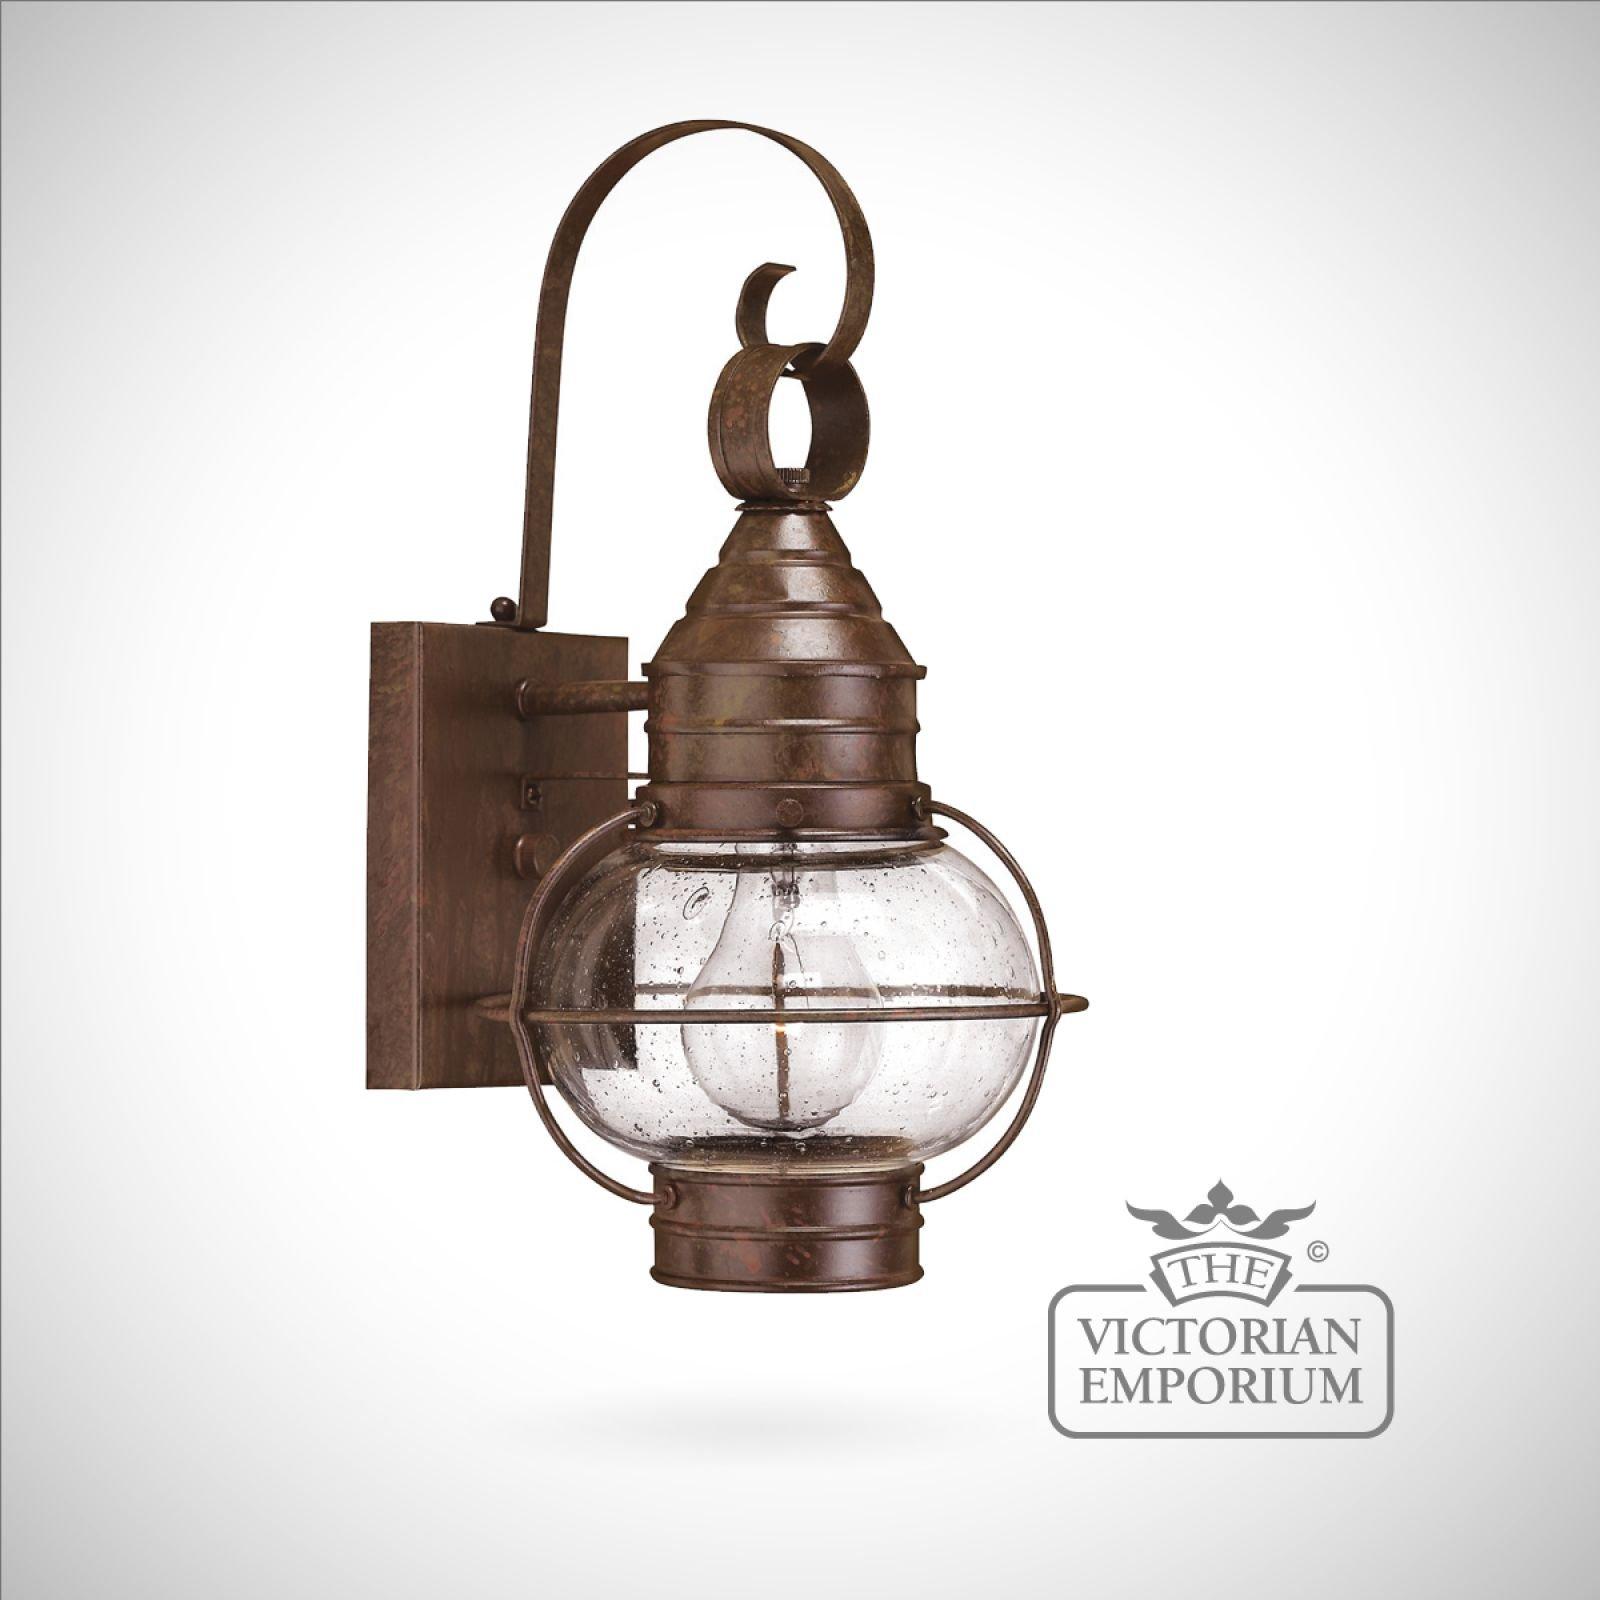 lamp lighting old classical lighting pendant wall victorian decorative. Black Bedroom Furniture Sets. Home Design Ideas